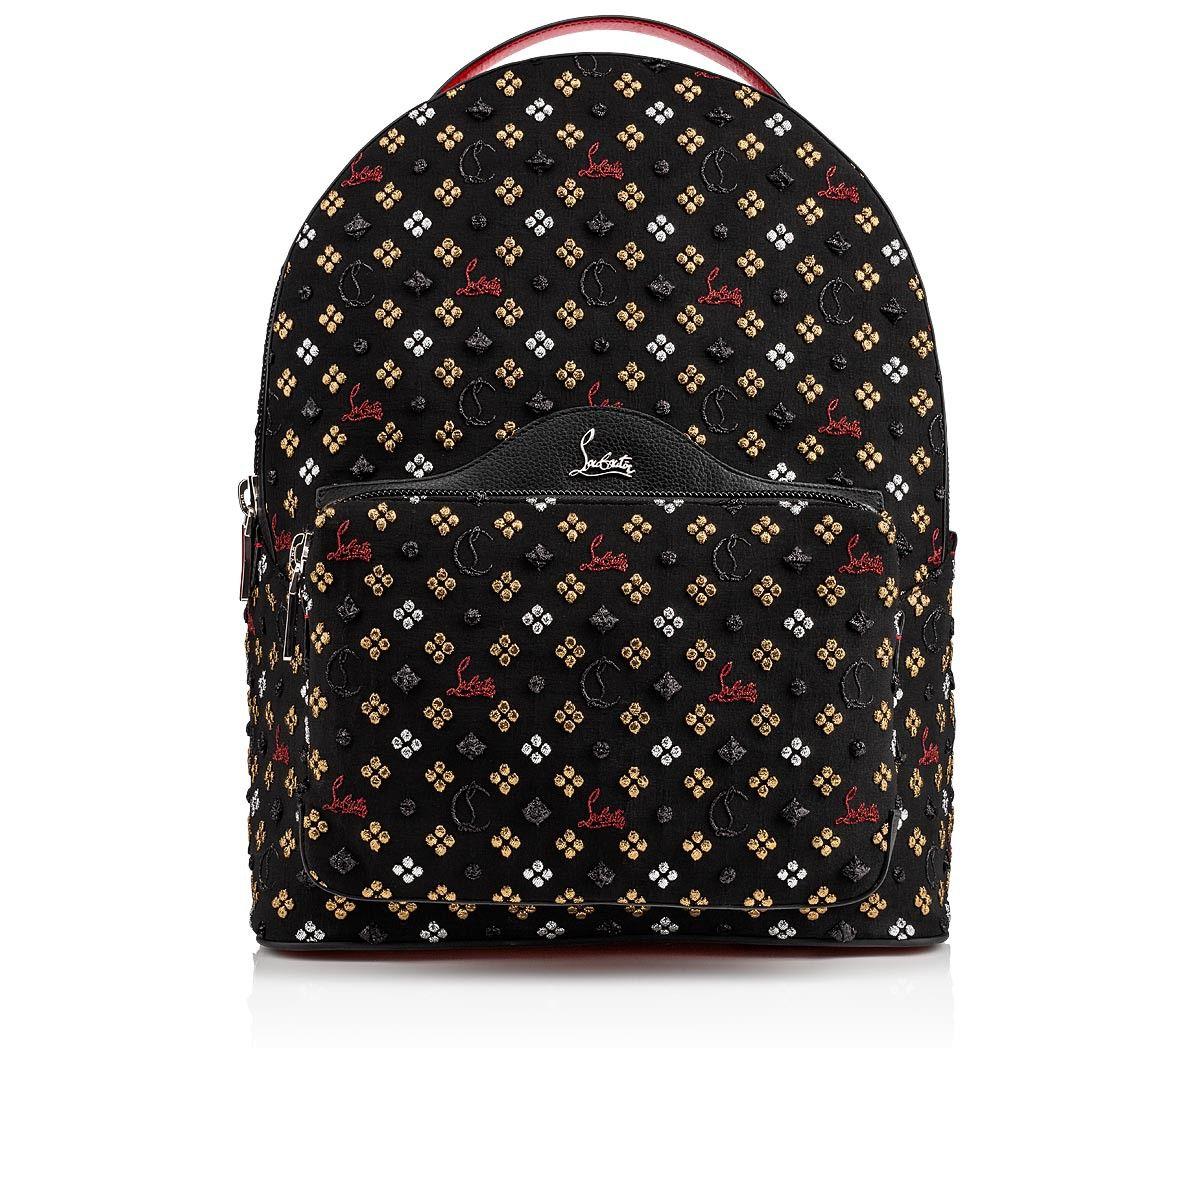 cd3be4eafe0 CHRISTIAN LOUBOUTIN Backloubi Backpack. #christianlouboutin #bags ...